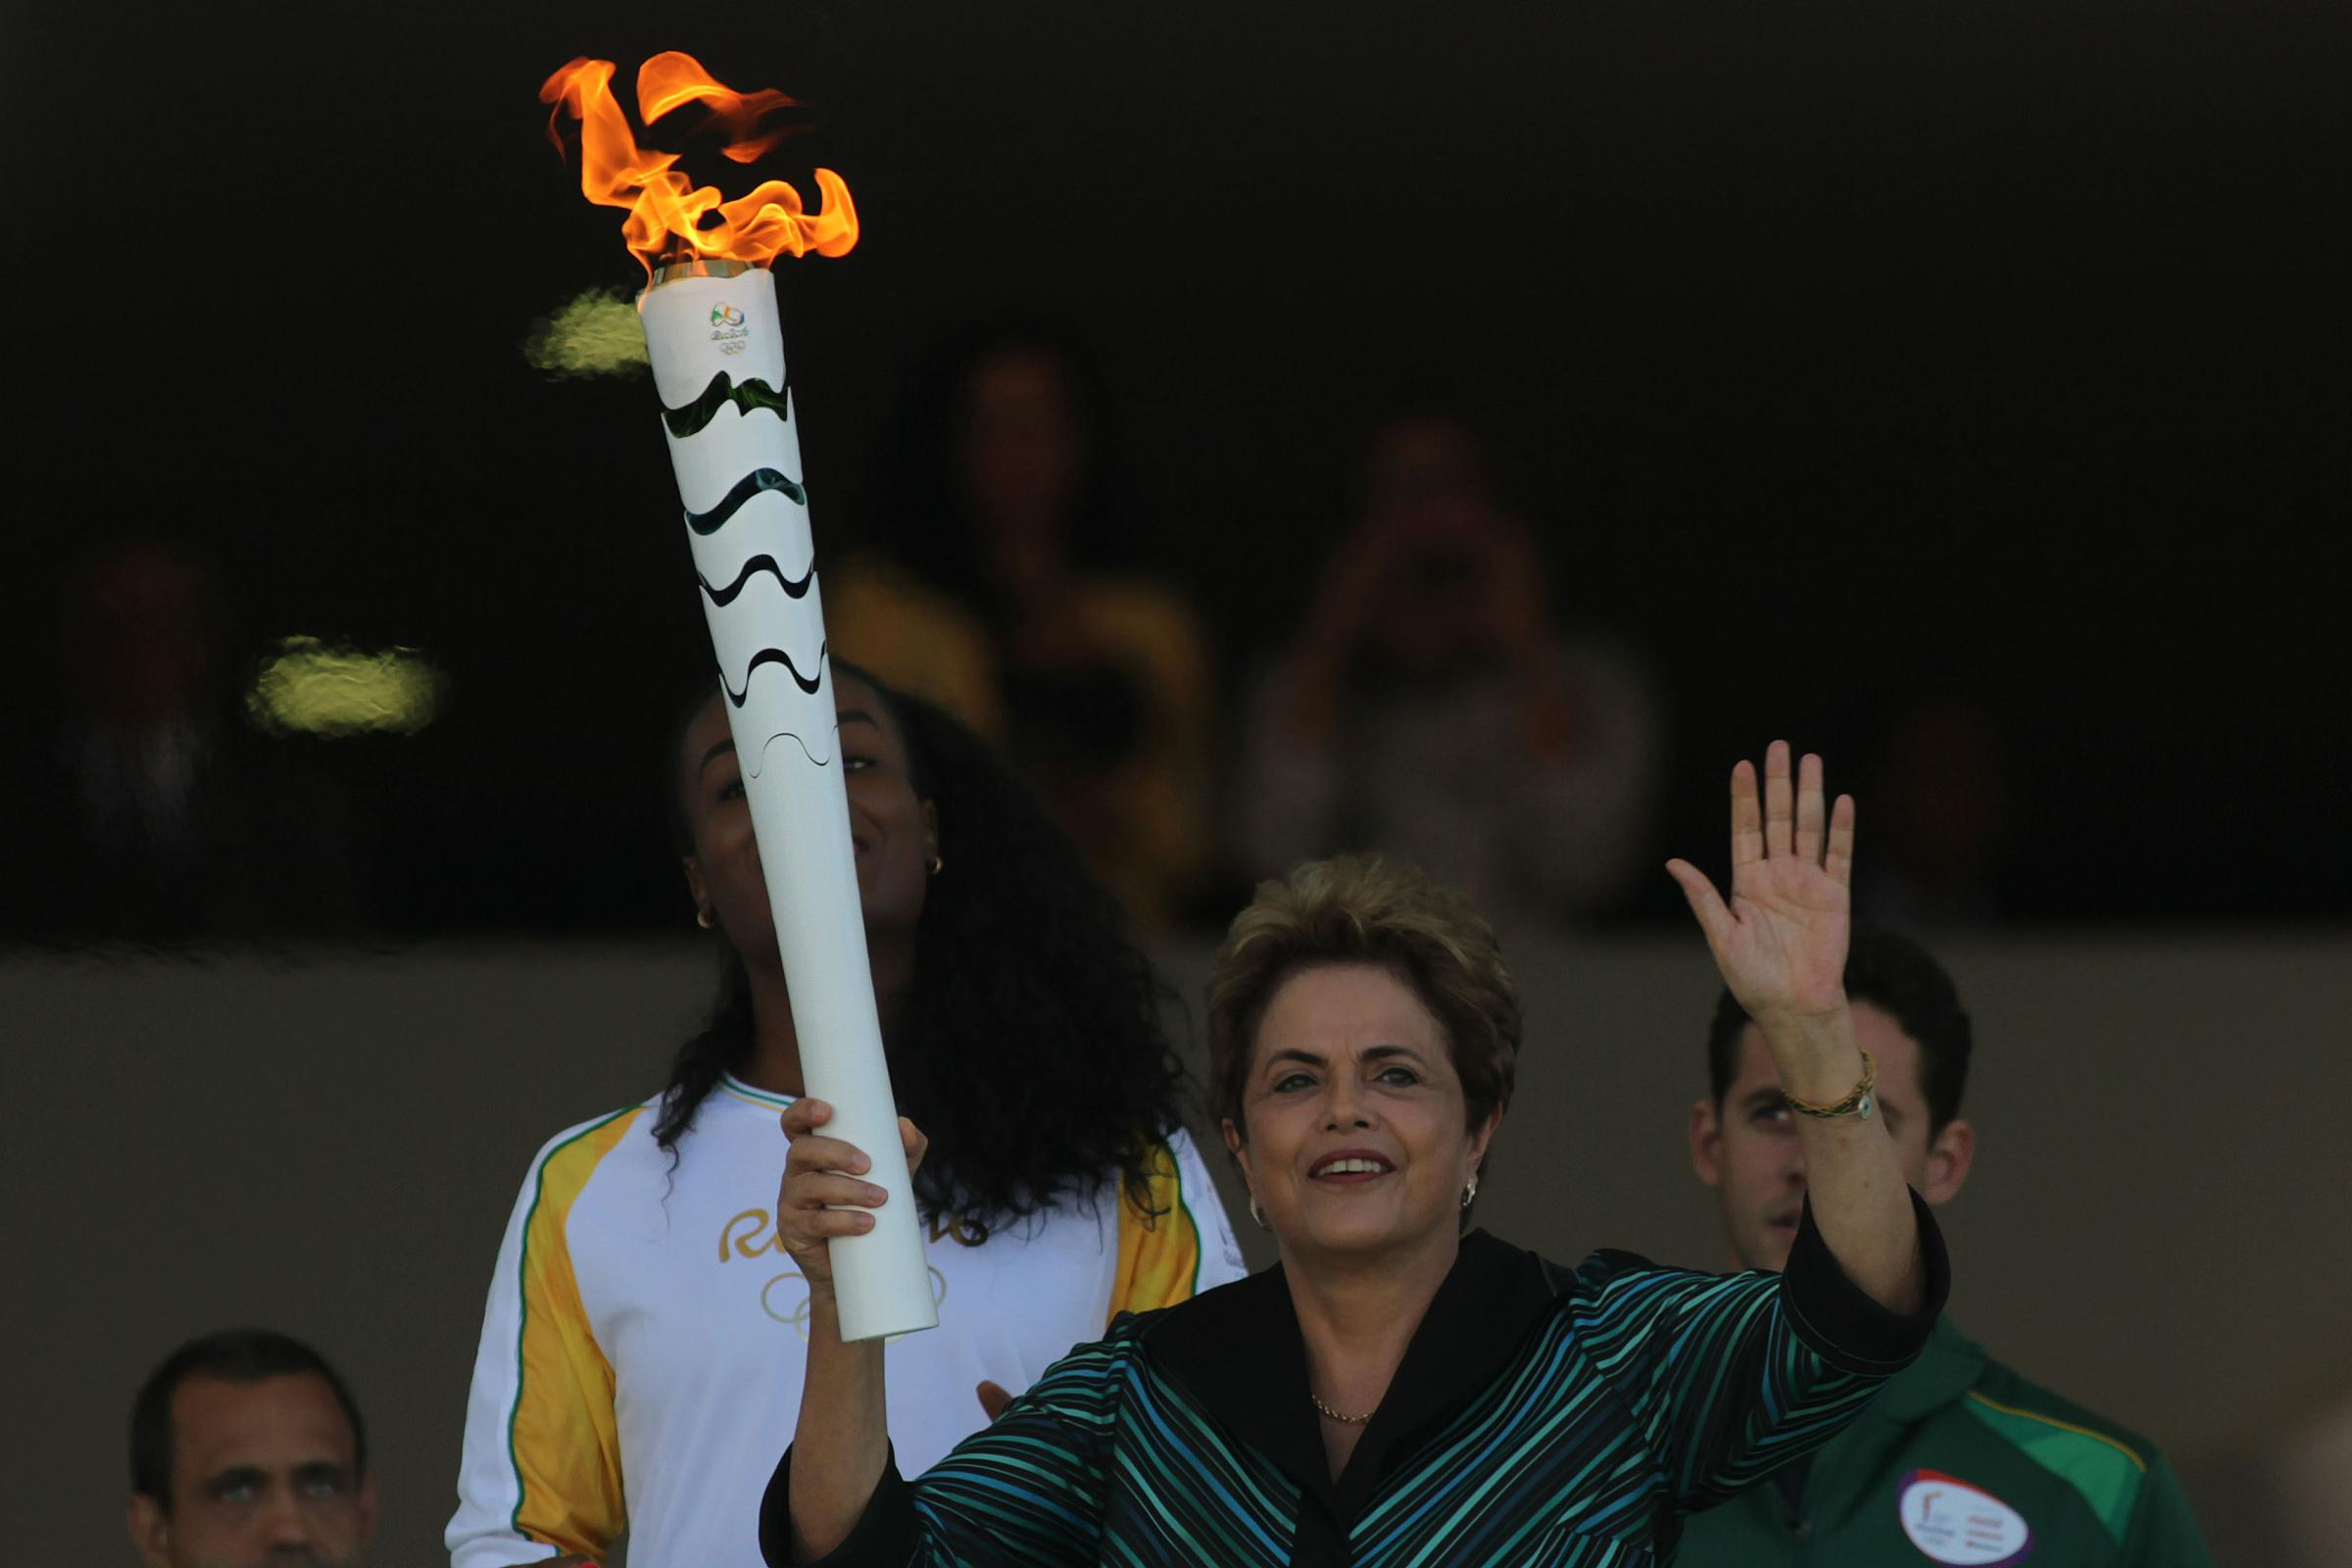 Olimpiadi Rio 2016, la torcia olimpica arriva a Brasilia